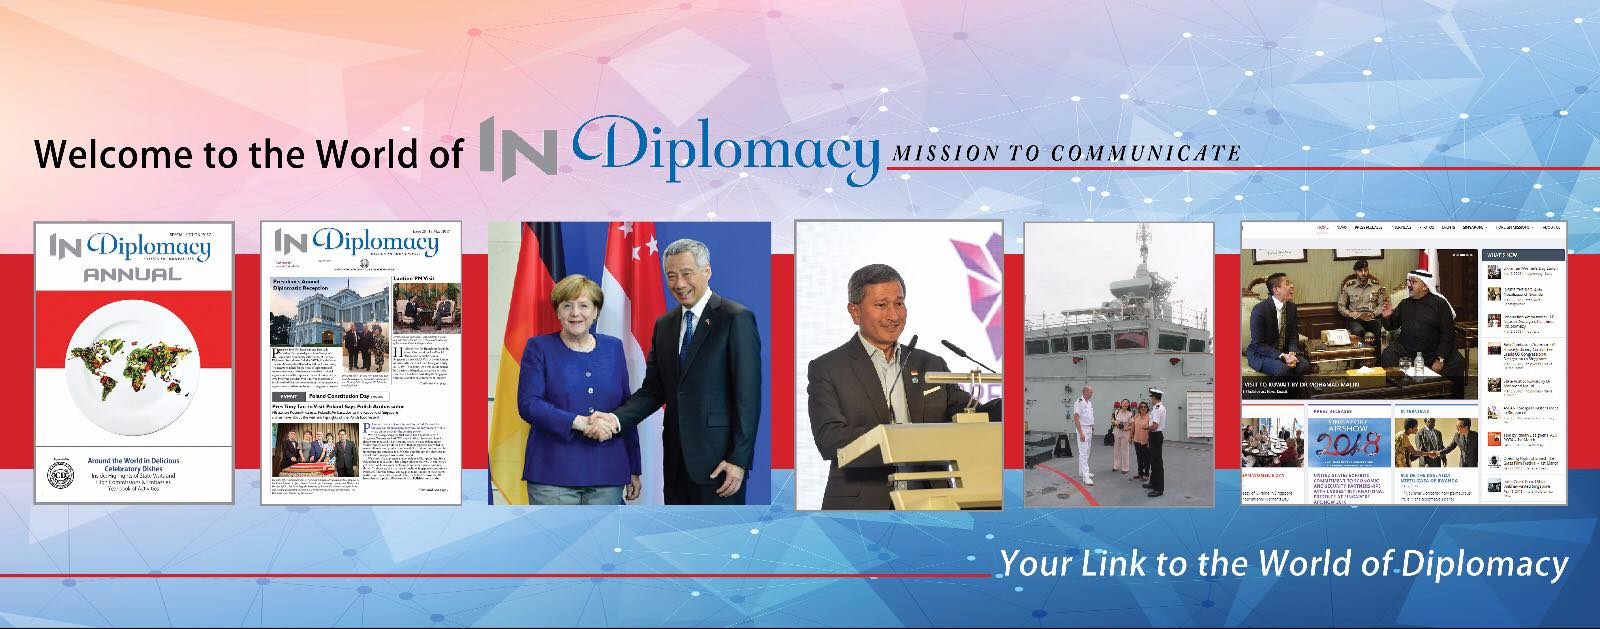 www.indiplomacy.com